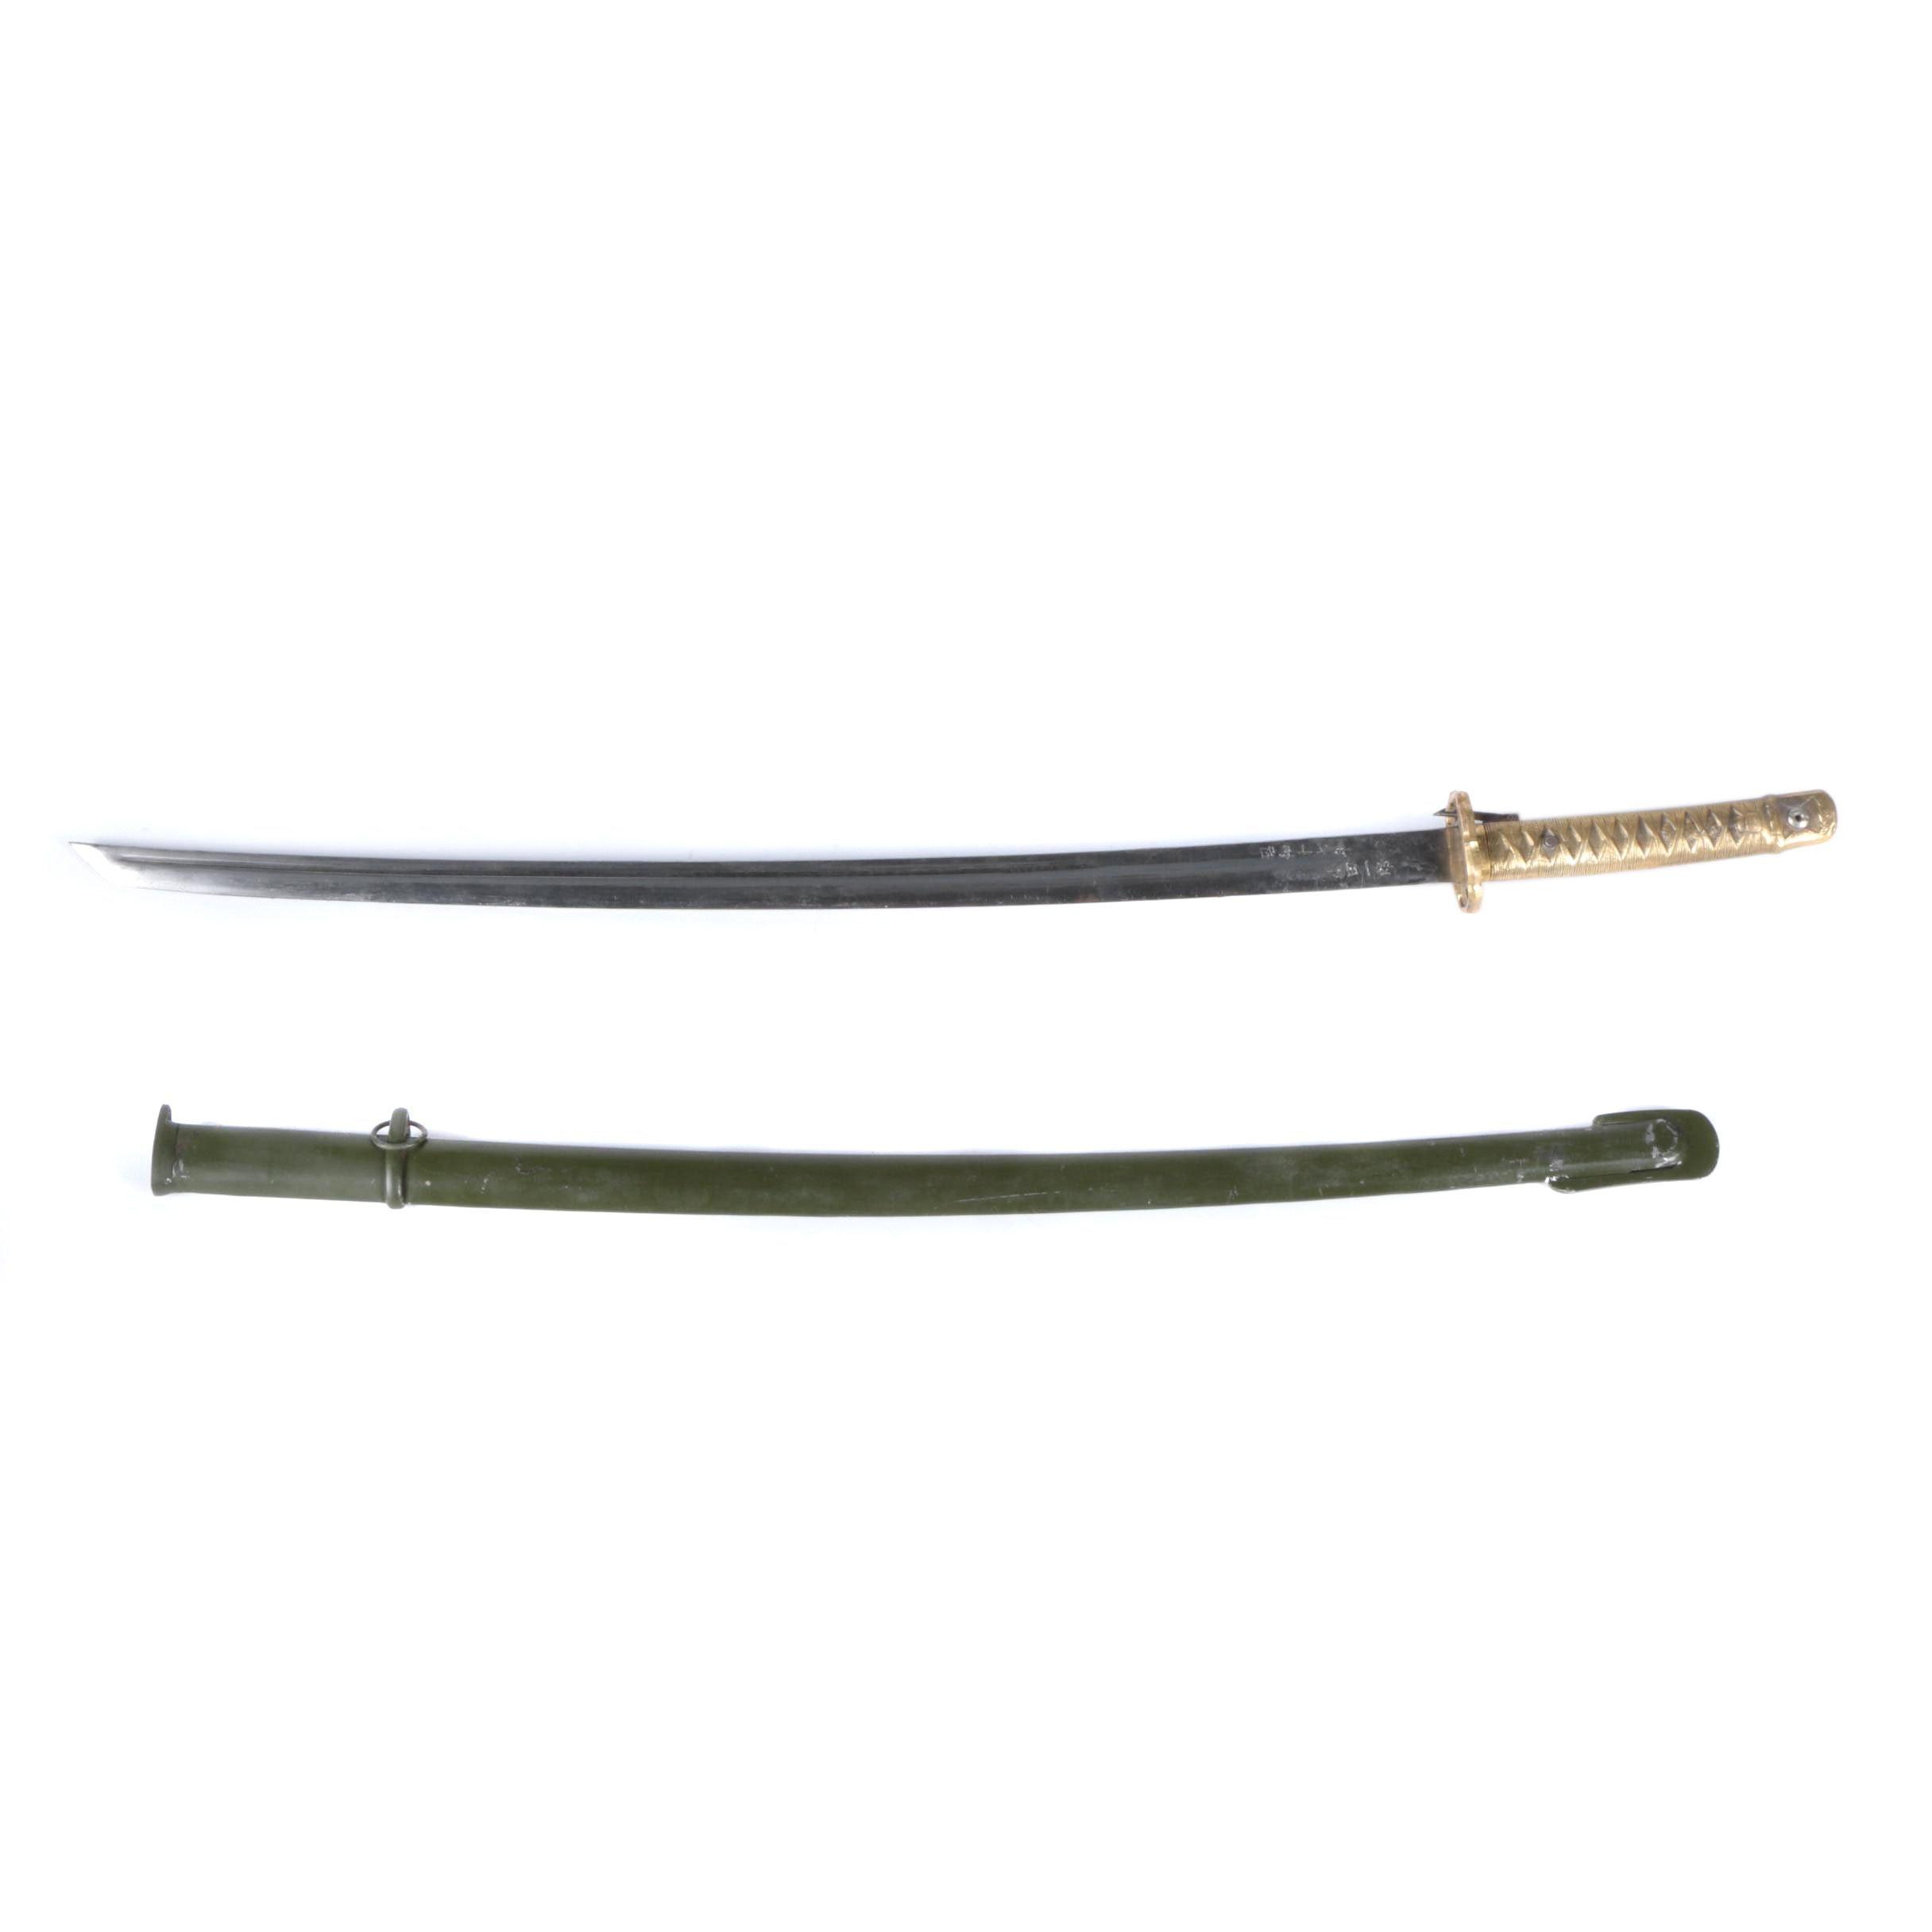 World War II Japanese Shin-Guntō NCO Sword with Metal Scabbard